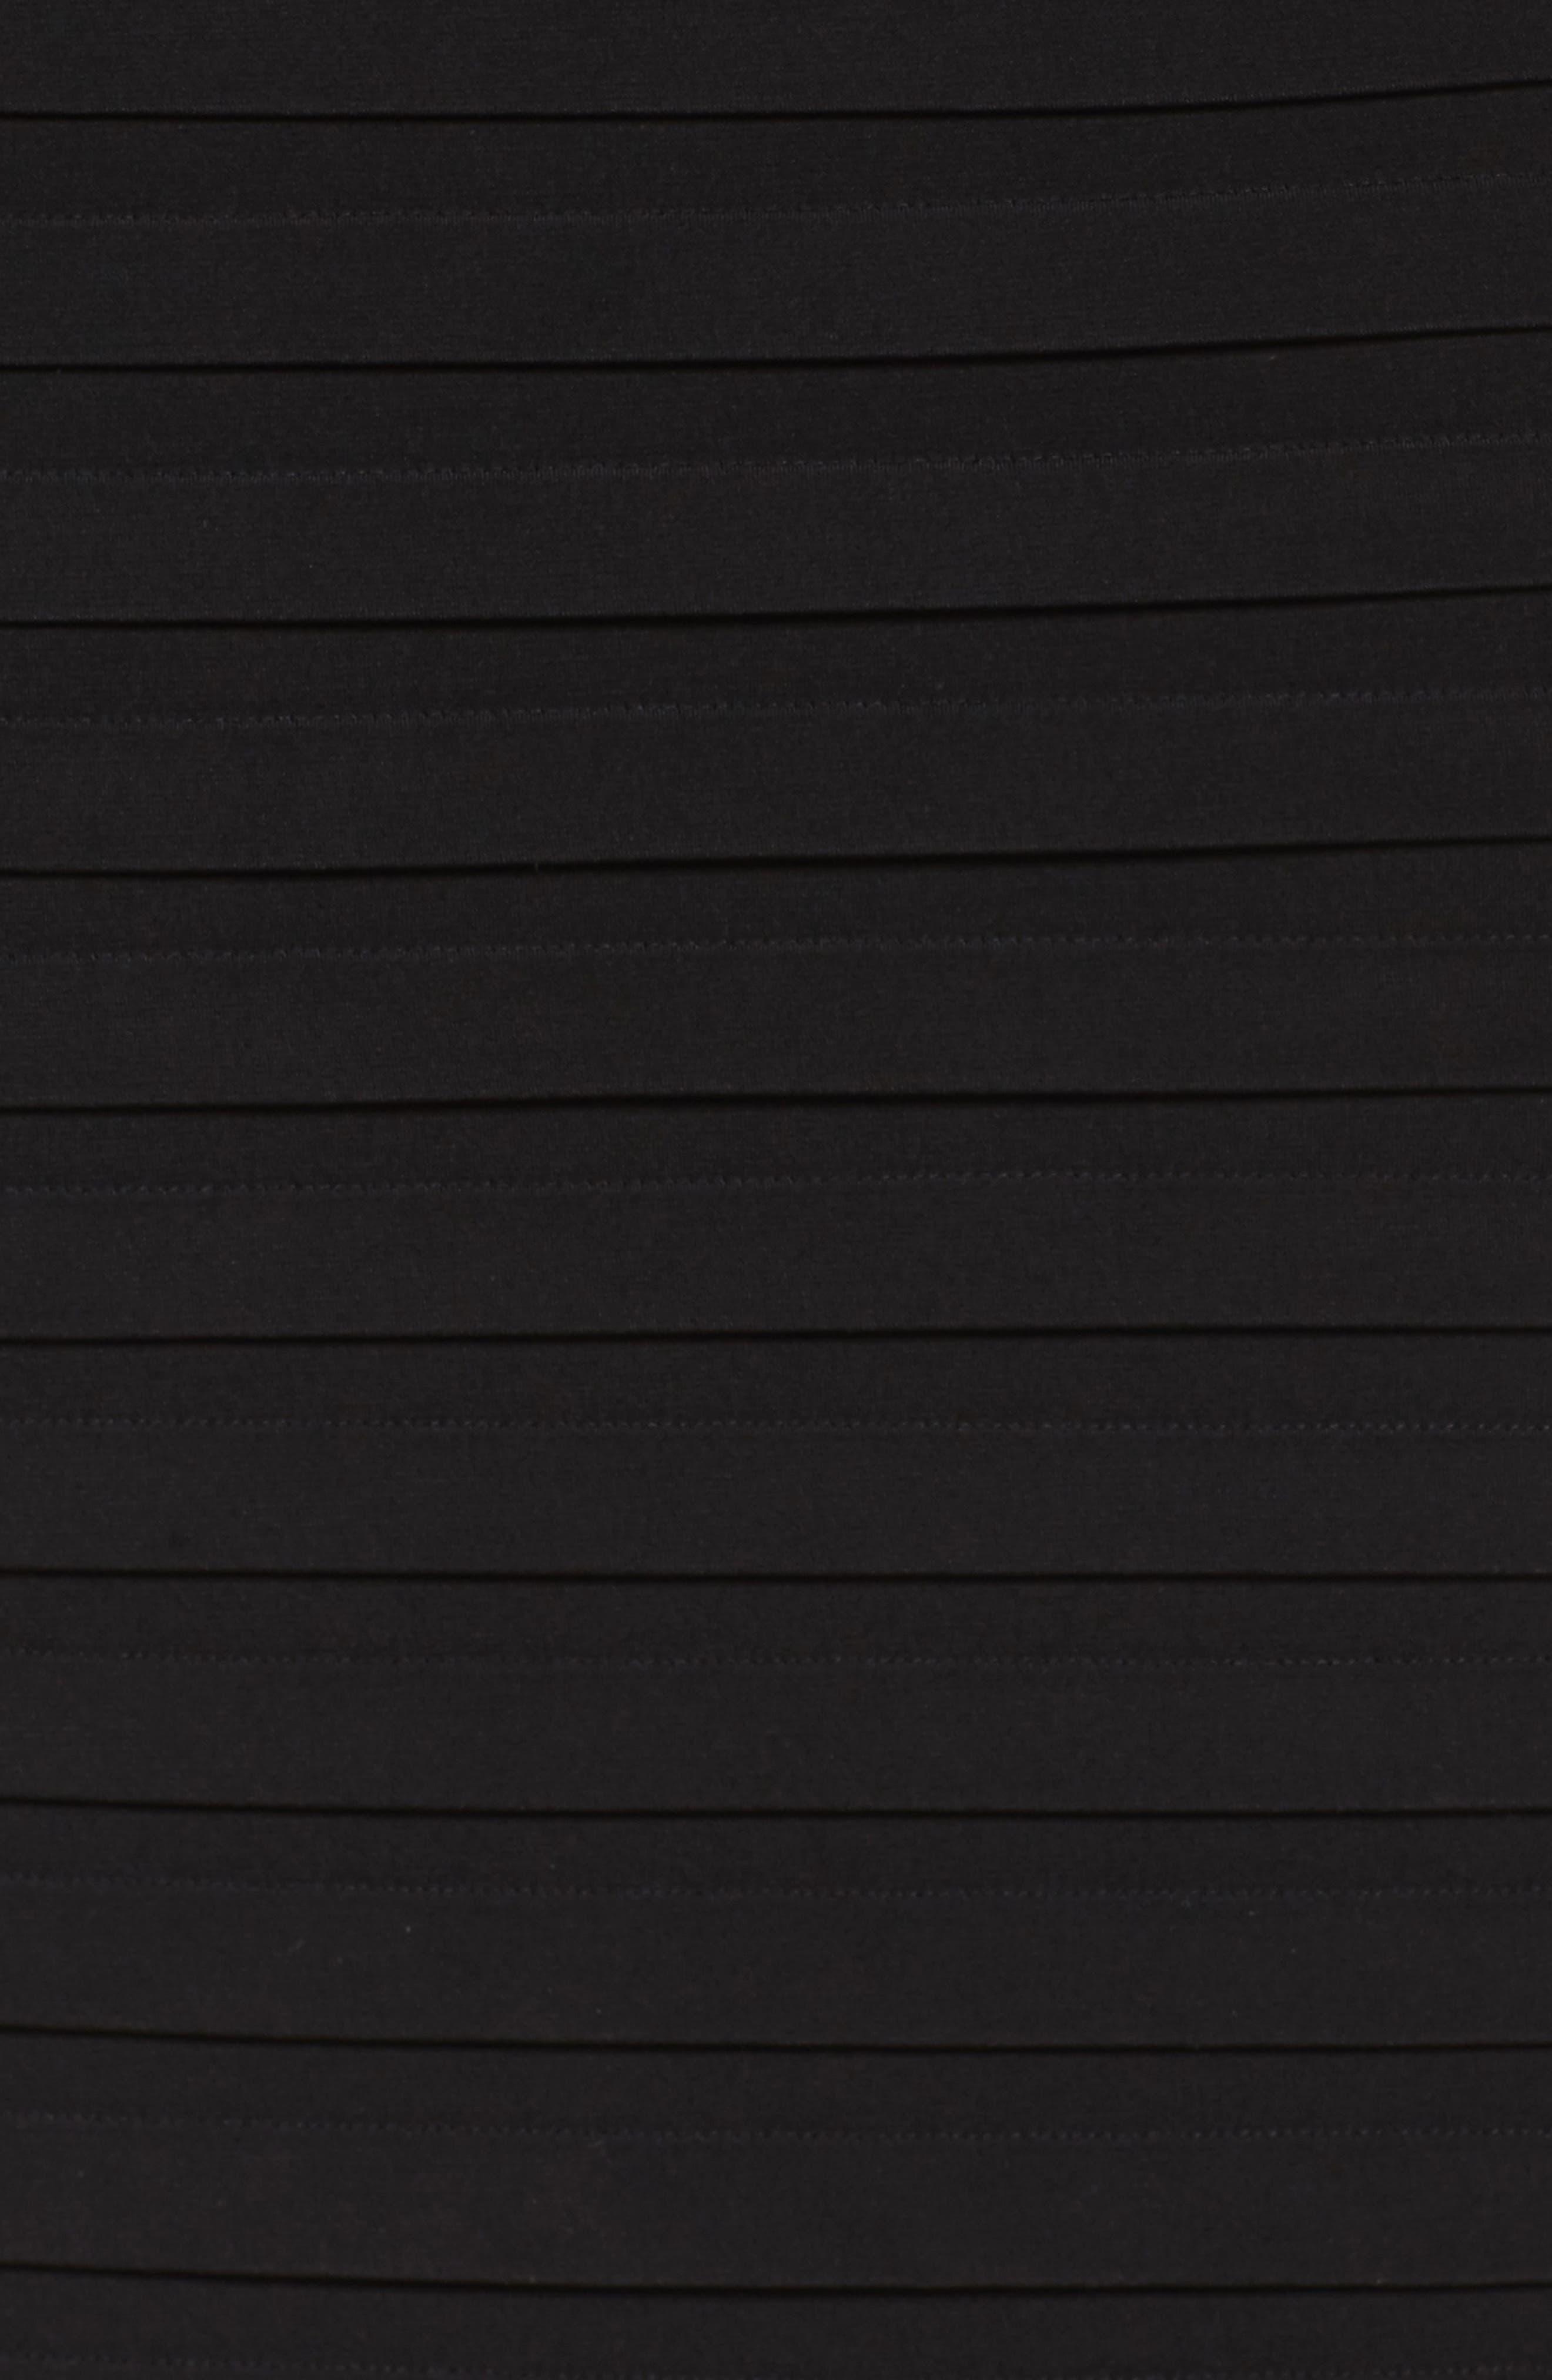 Matte Jersey Shutter Pleat Dress,                             Alternate thumbnail 5, color,                             005